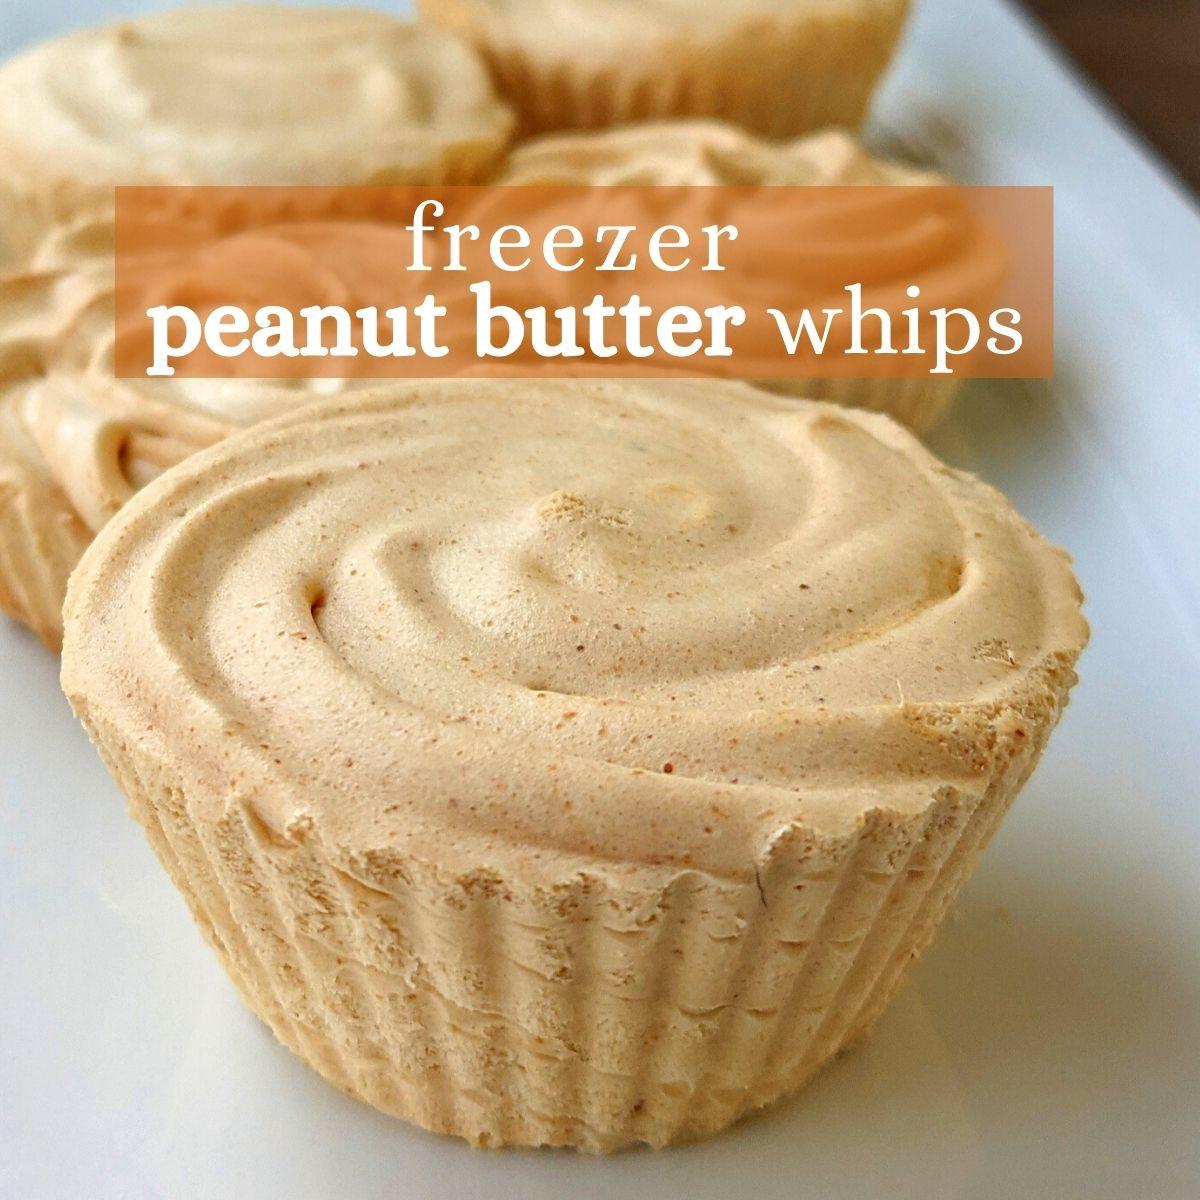 Freezer peanut butter whips low calorie thumbnail